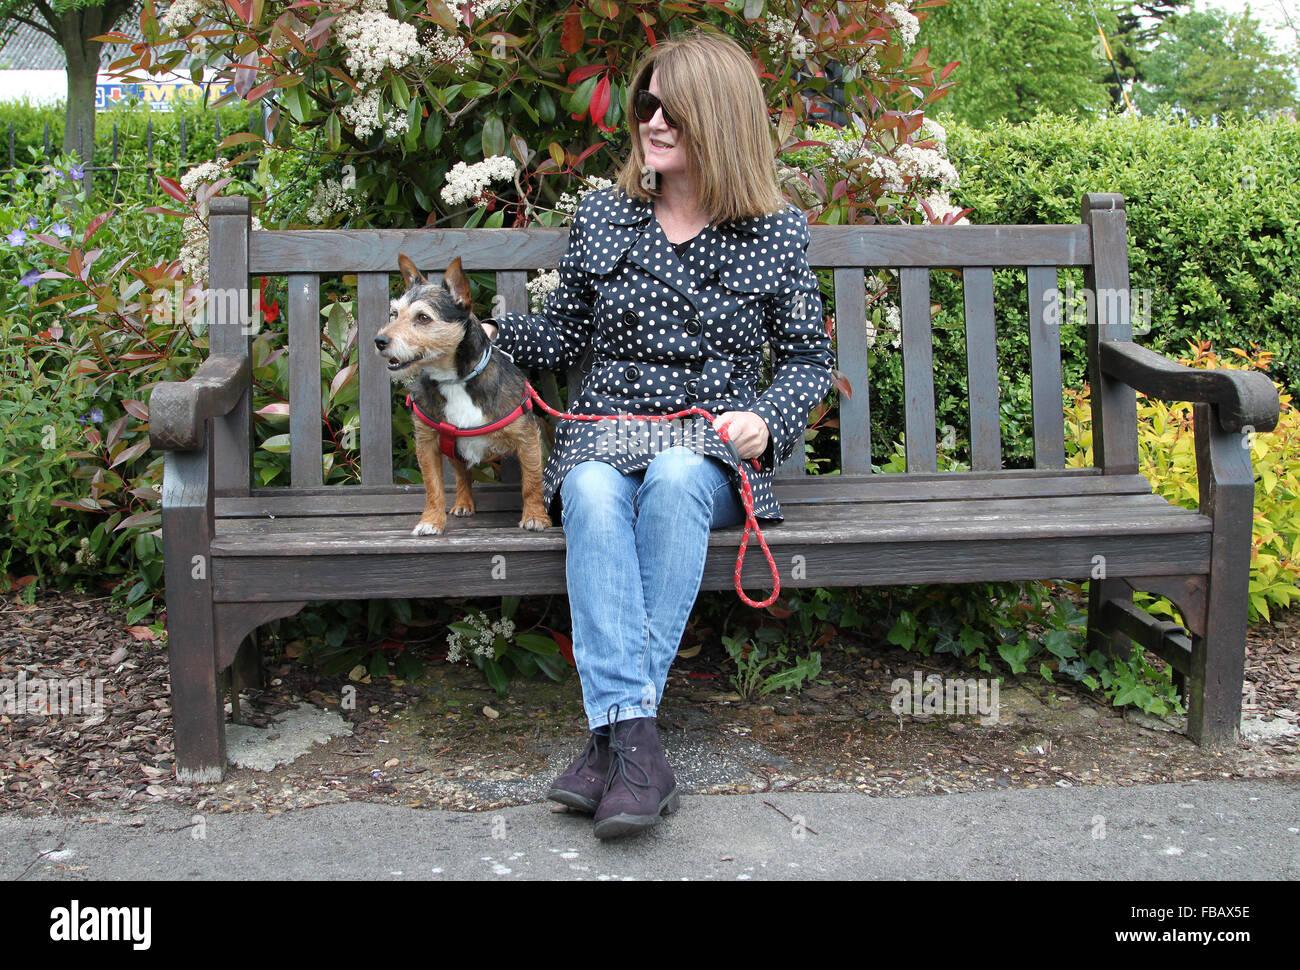 Awesome Woman Sitting On Park Bench With Small Dog Waiting For Frankydiablos Diy Chair Ideas Frankydiabloscom